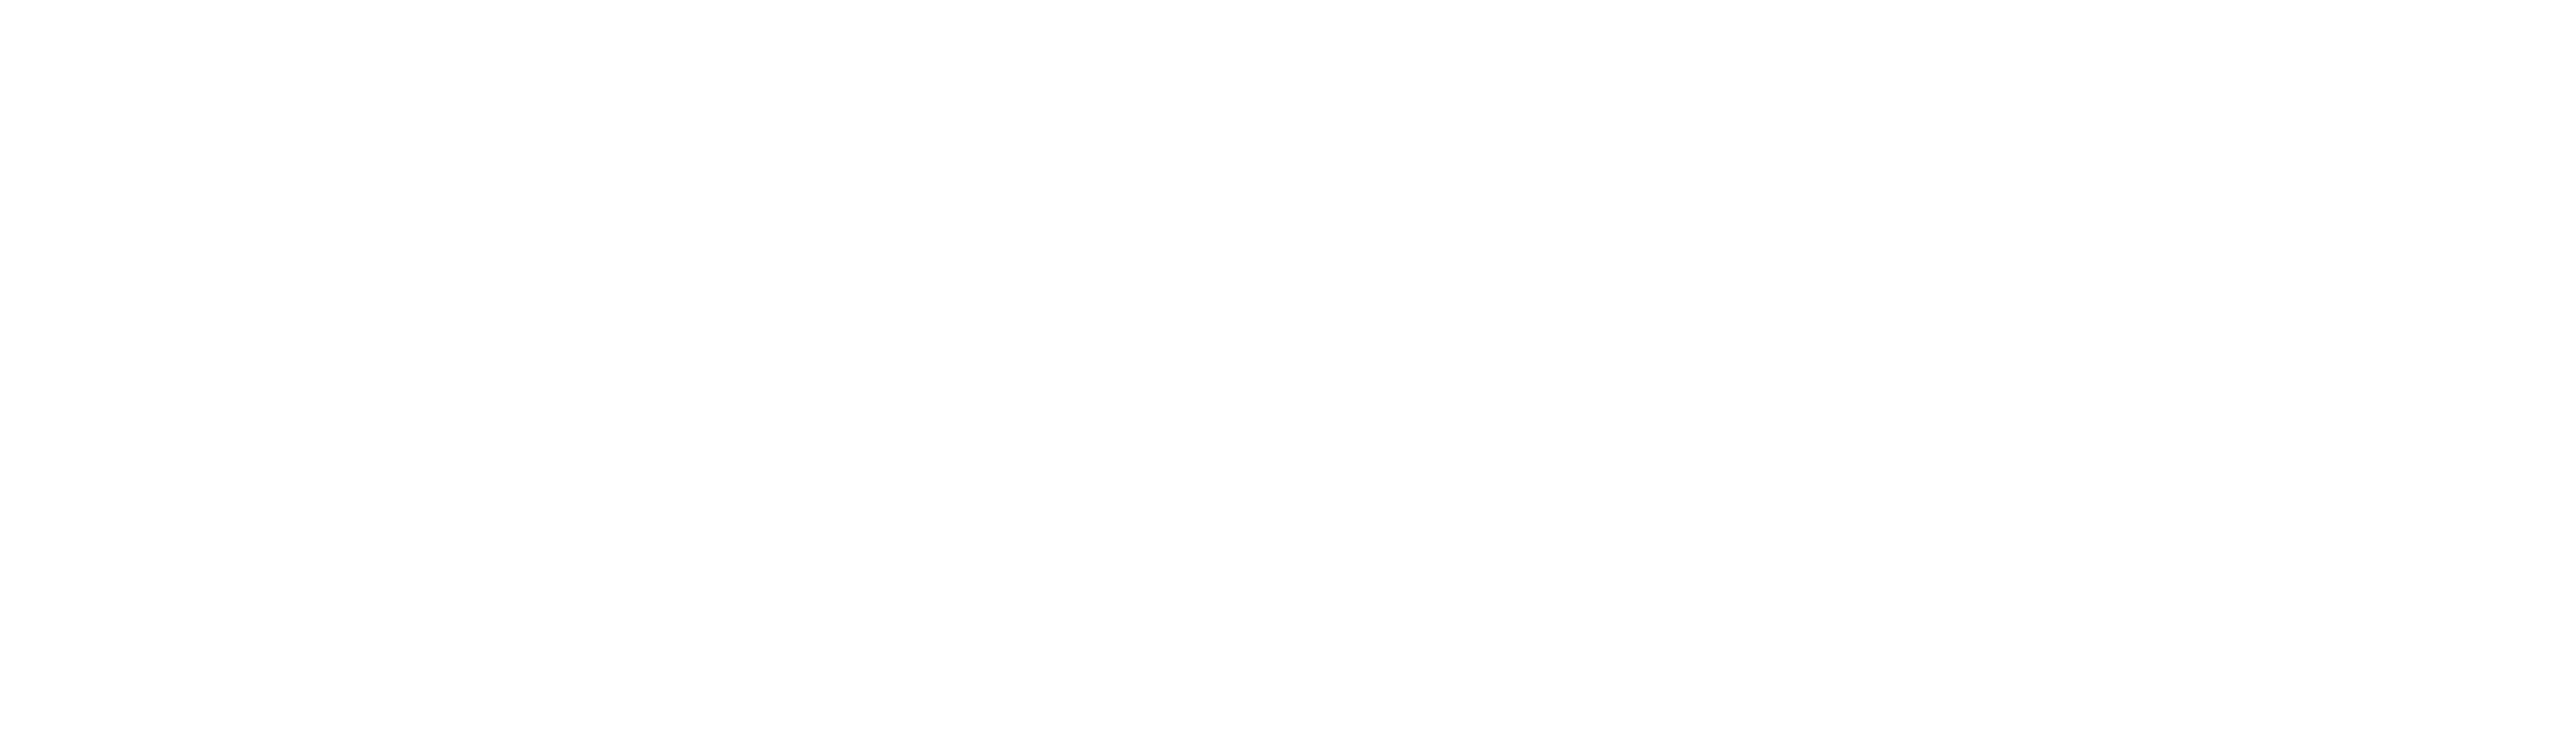 SHFM 3 - White